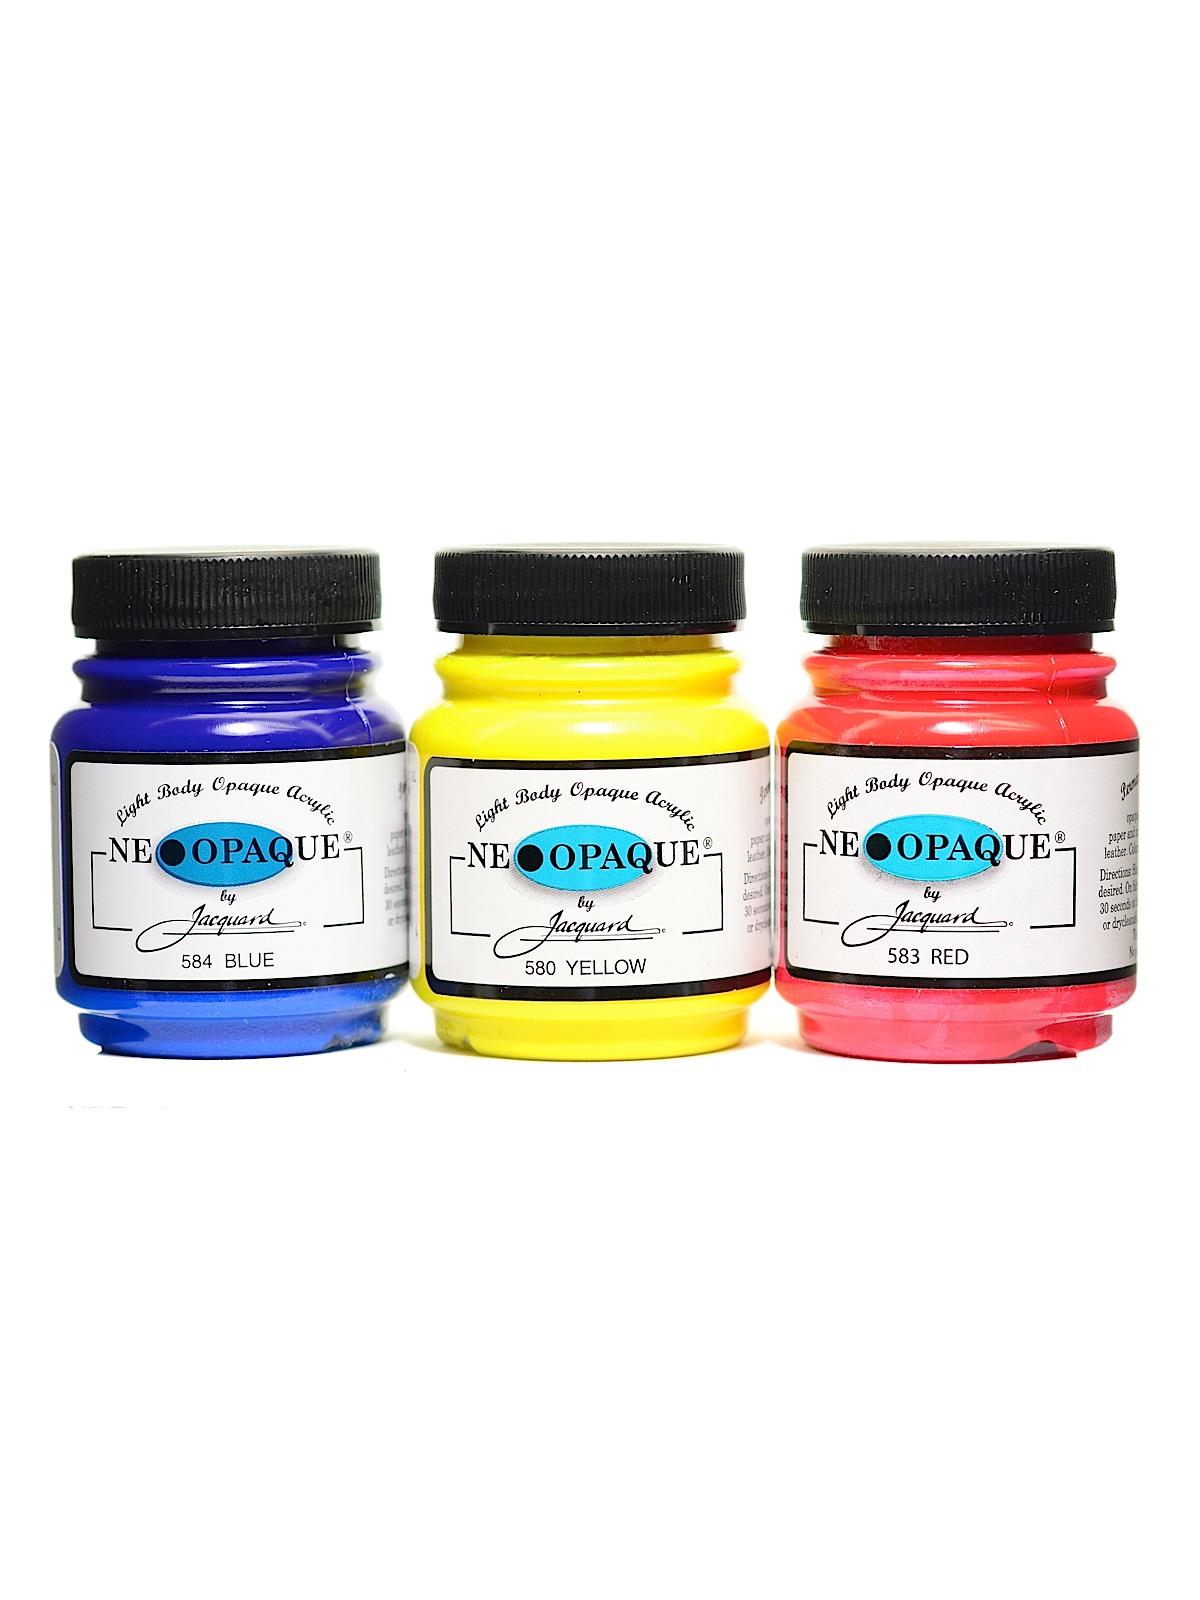 Jacquard - Neopaque Colors